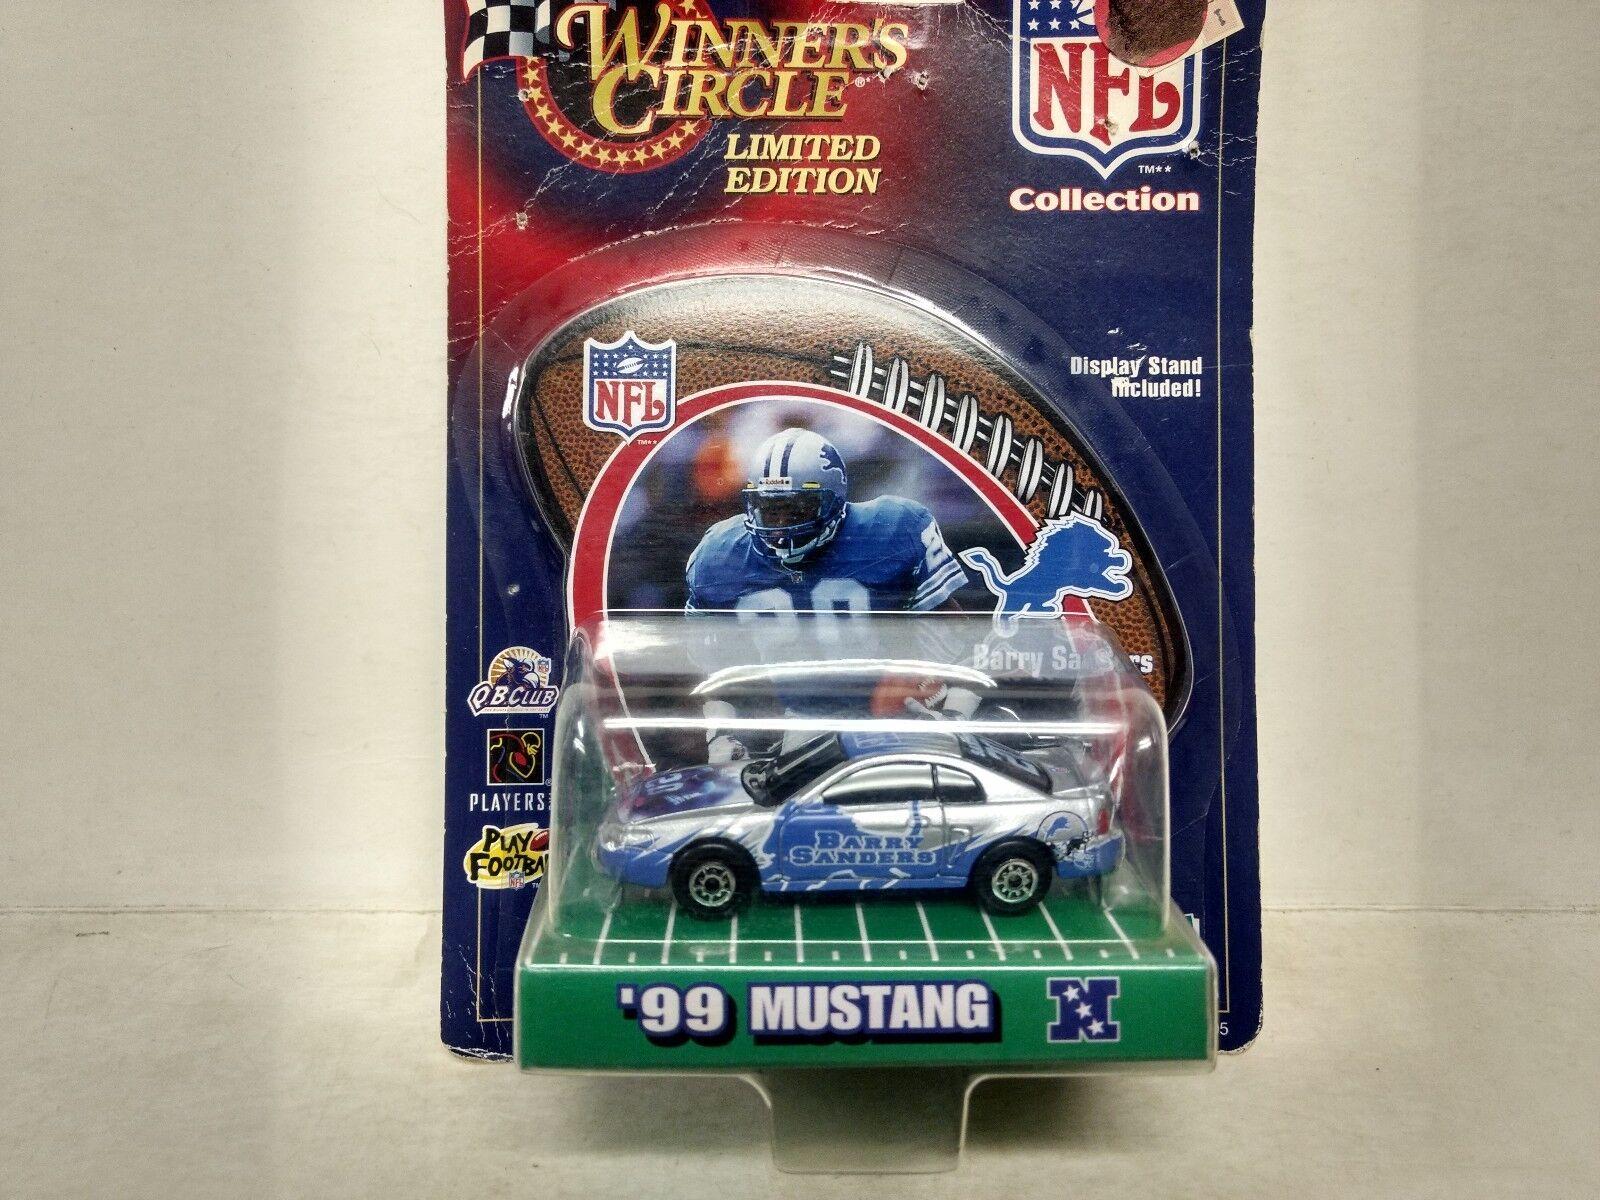 Nascar Gagnants Cercle Barry Sanders NFL Collection 1 64